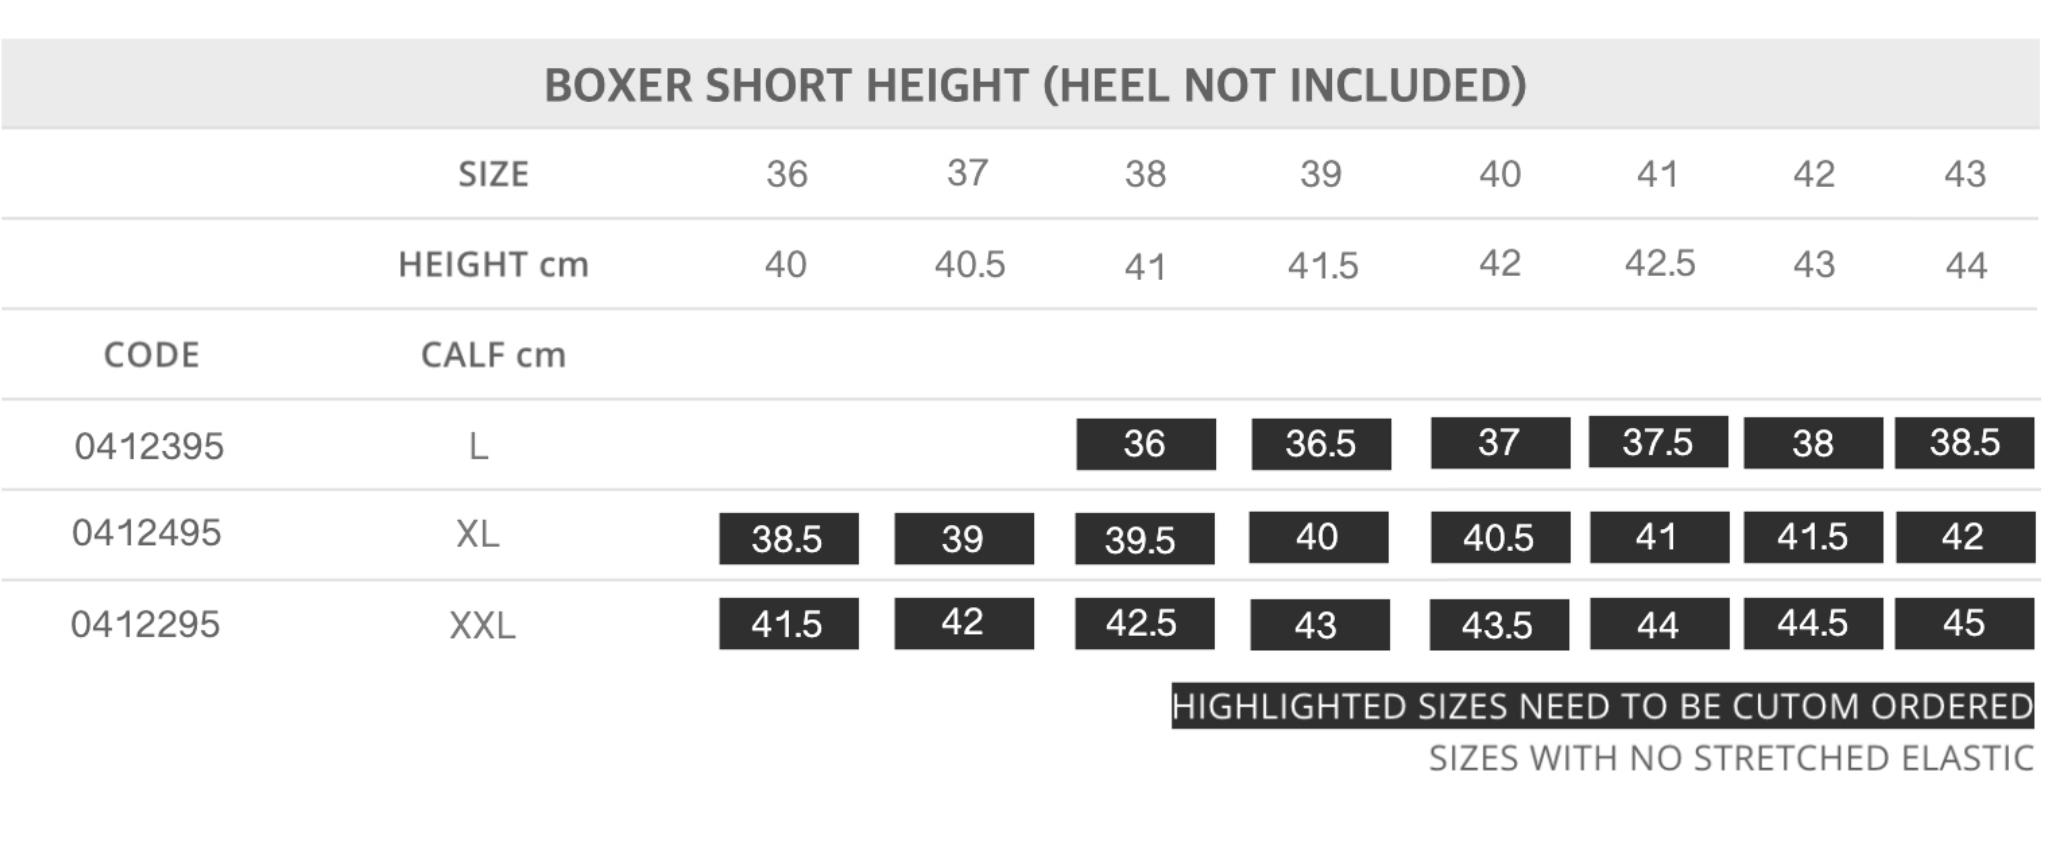 Short Boxer Size Chart for Tattini Boots Italian English Riding Boots